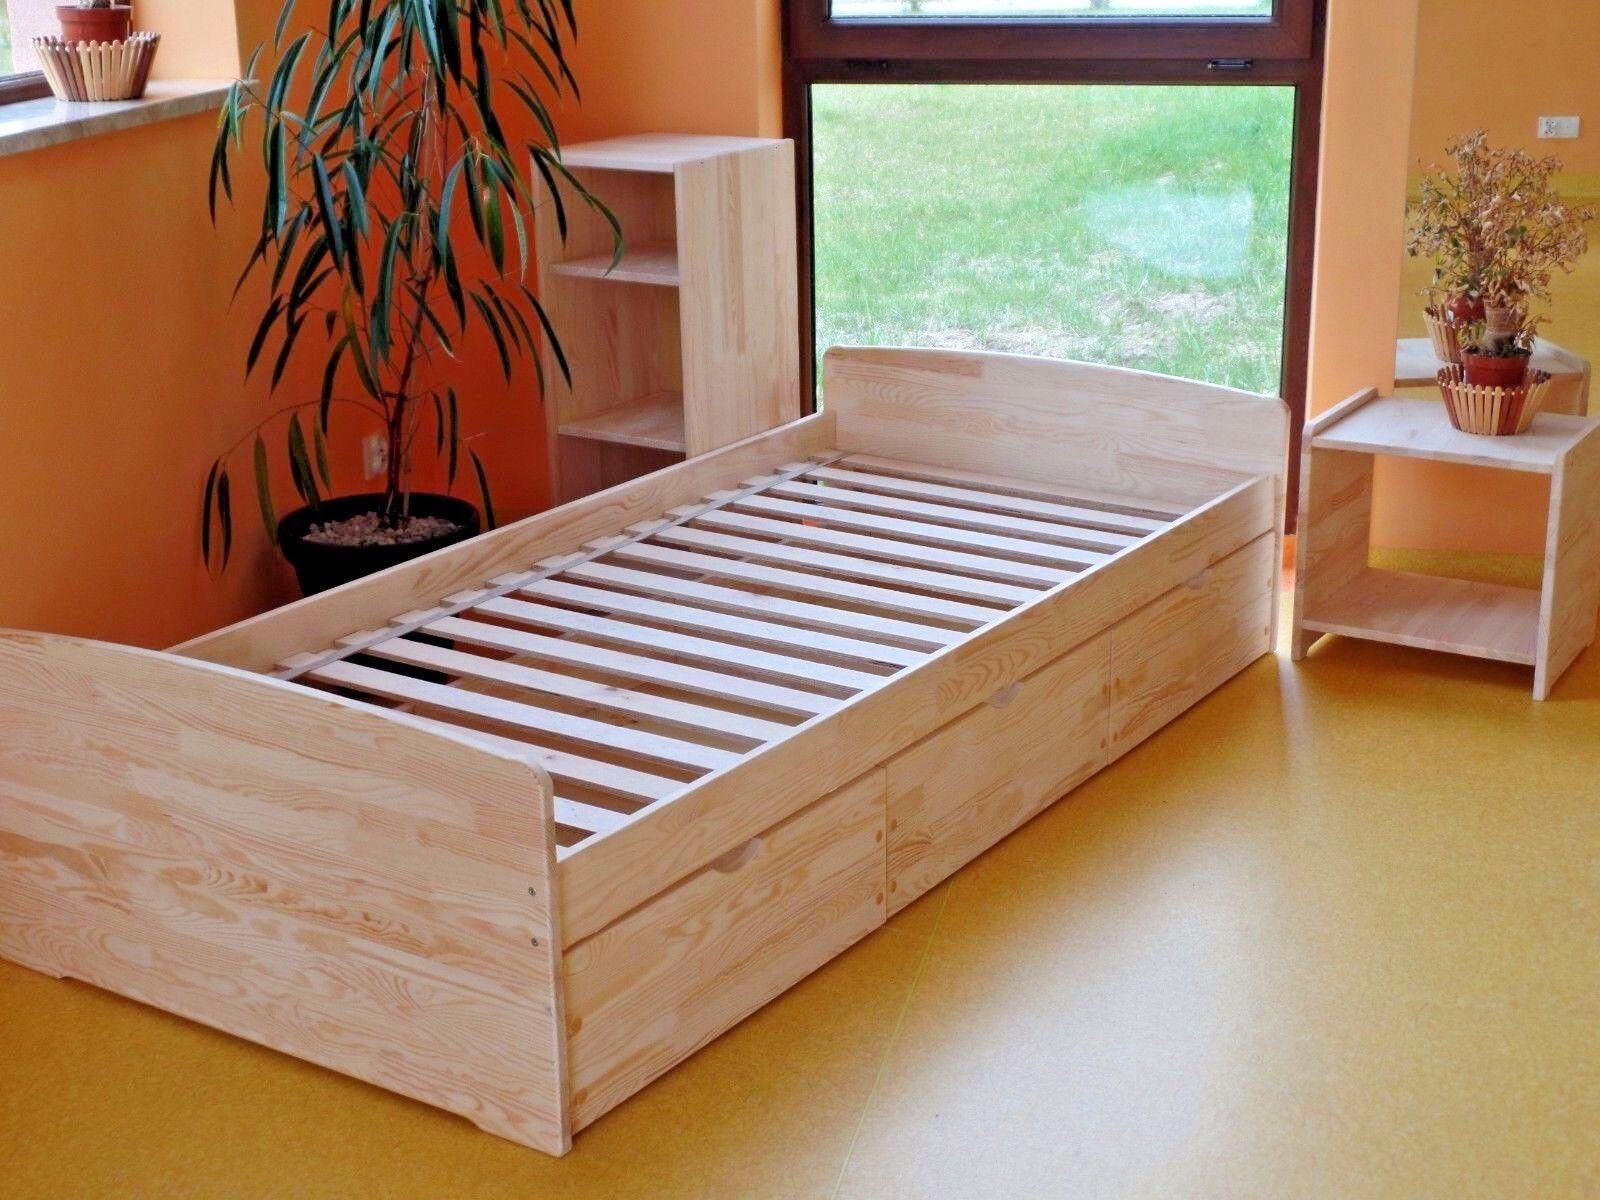 kinderbett funktionsbett einzelbett kojenbett jugendbett 90x200 voll massivholz eur 115 90. Black Bedroom Furniture Sets. Home Design Ideas